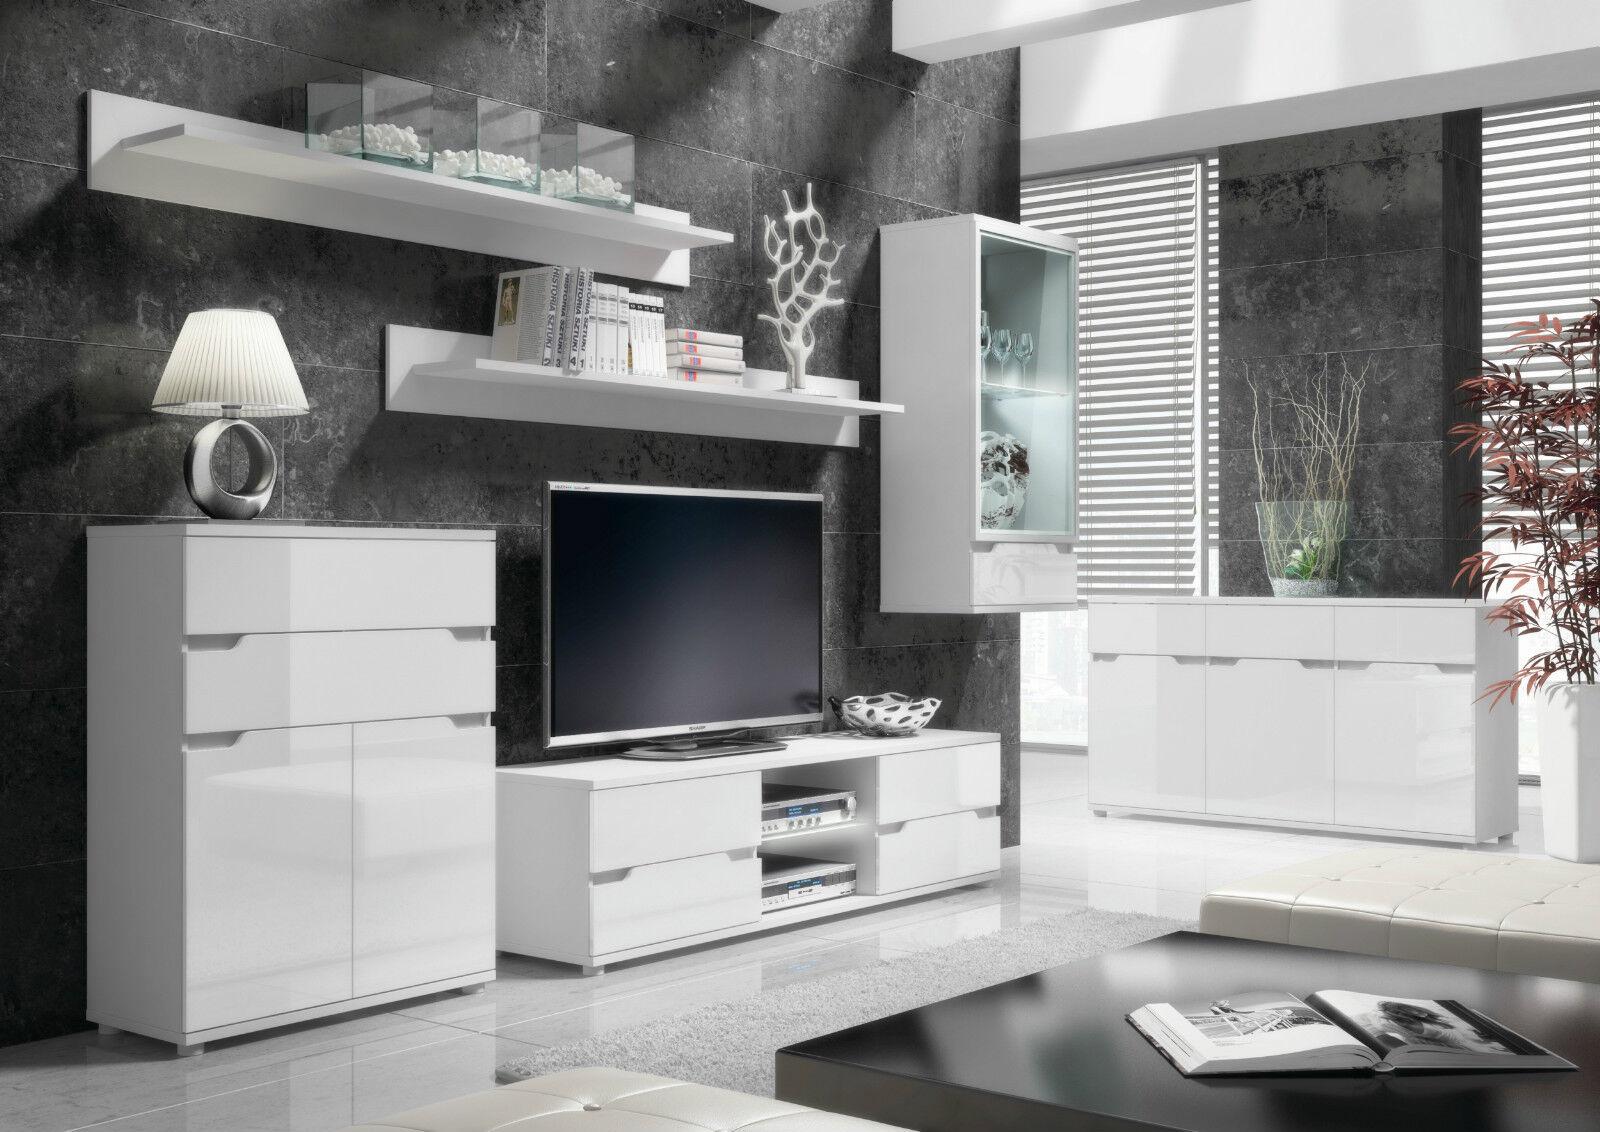 tv lounge furniture. Aspire High Gloss White Lounge Furniture Sideboard TV Unit Tall Display Cabinet Tv E